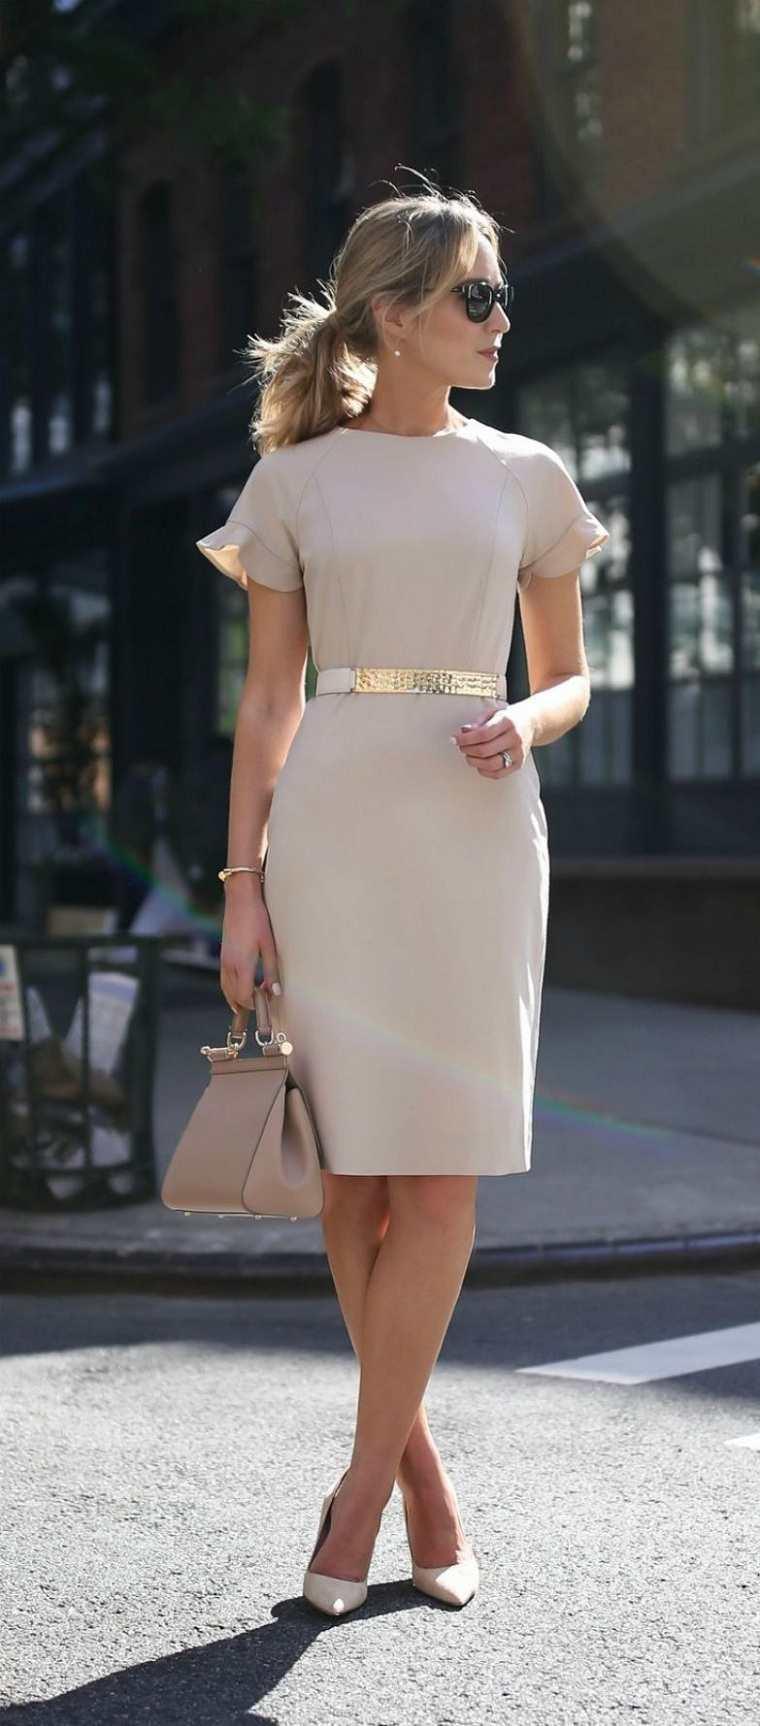 ropa-de-moda-para-mujer-ideas